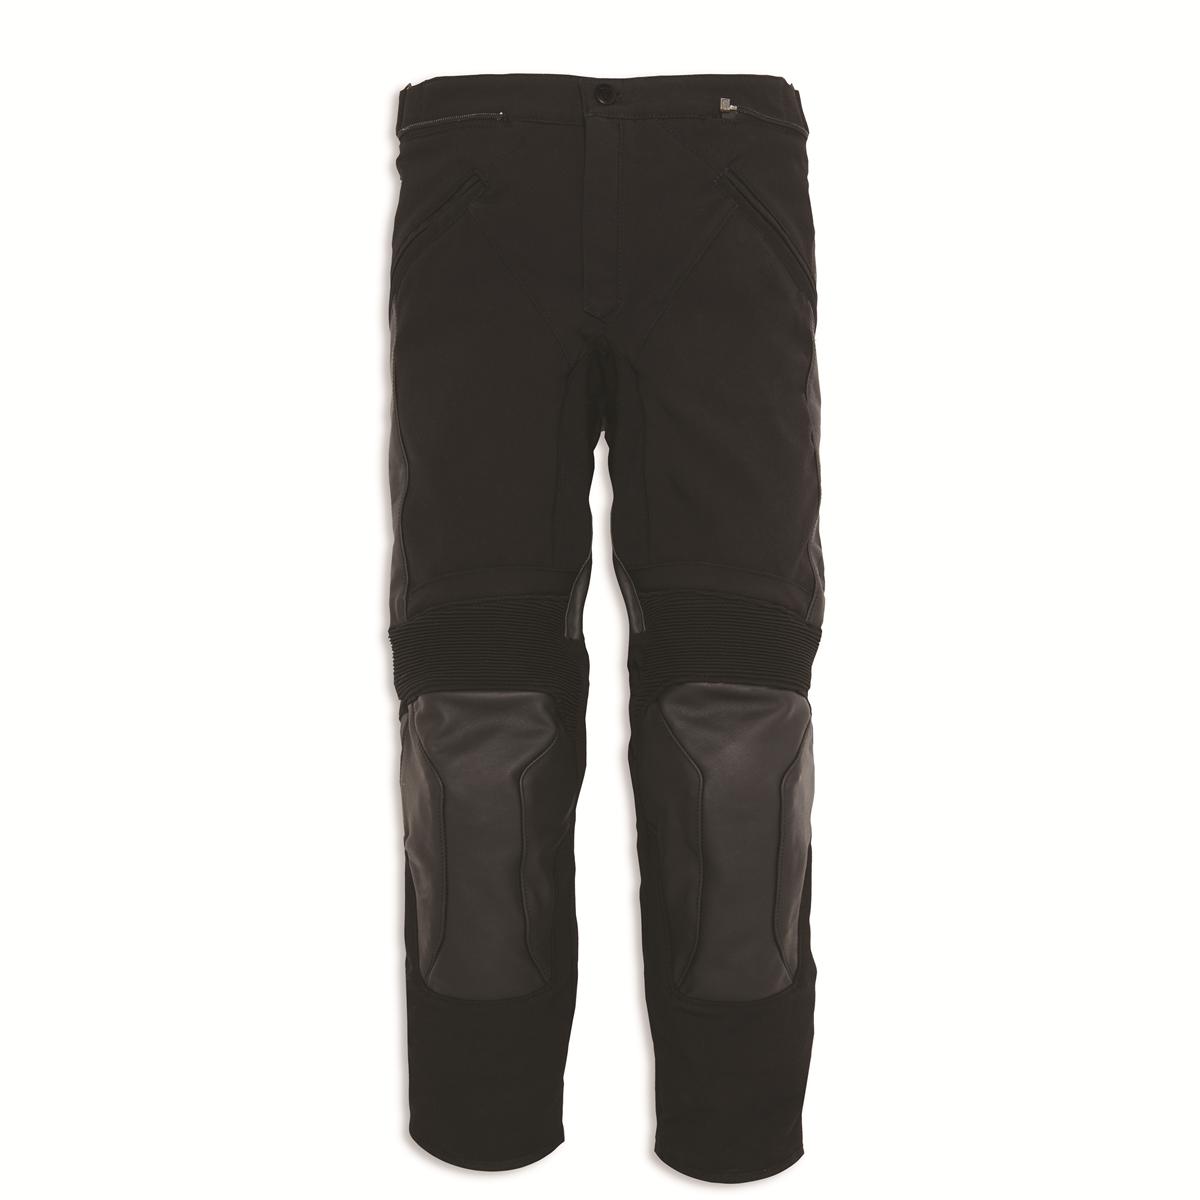 pantalon dainese company 2 ducati s team motos. Black Bedroom Furniture Sets. Home Design Ideas